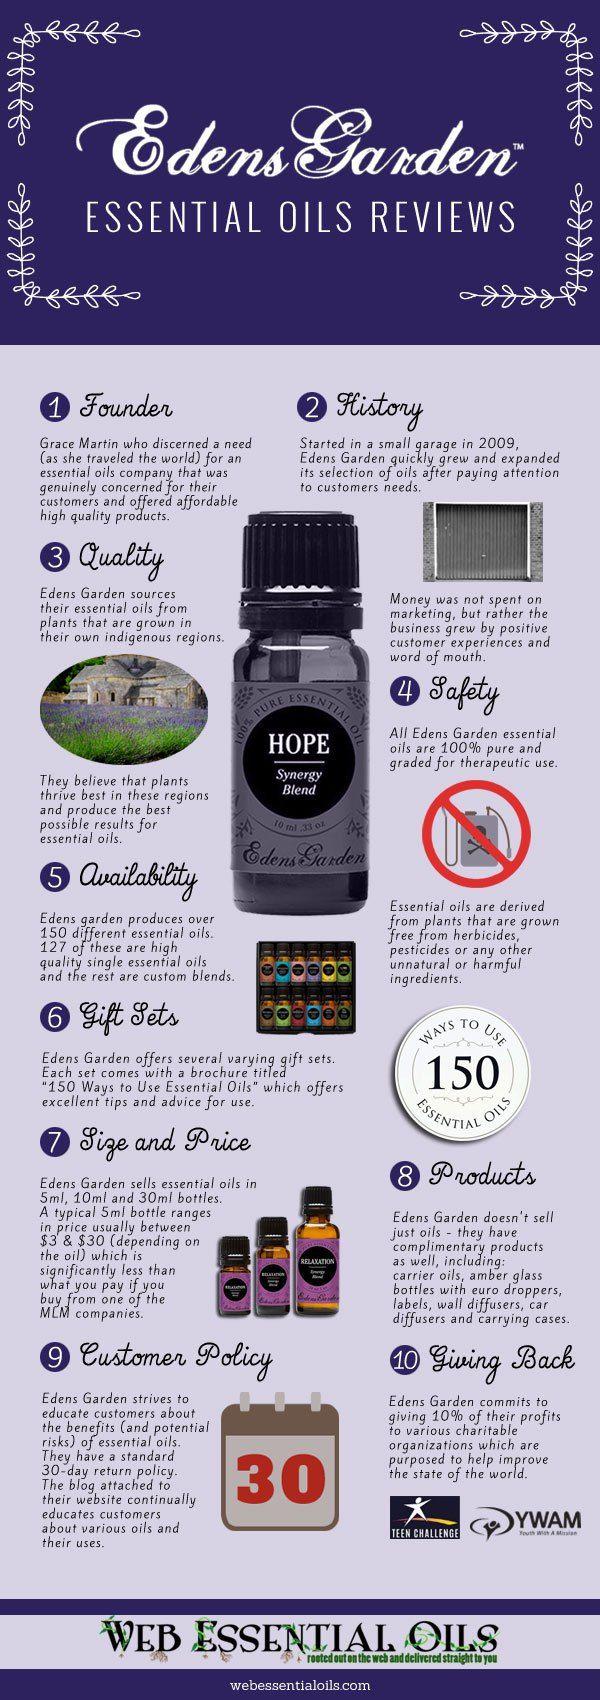 Edens garden essential oils reviews also best images on pinterest oil blends rh